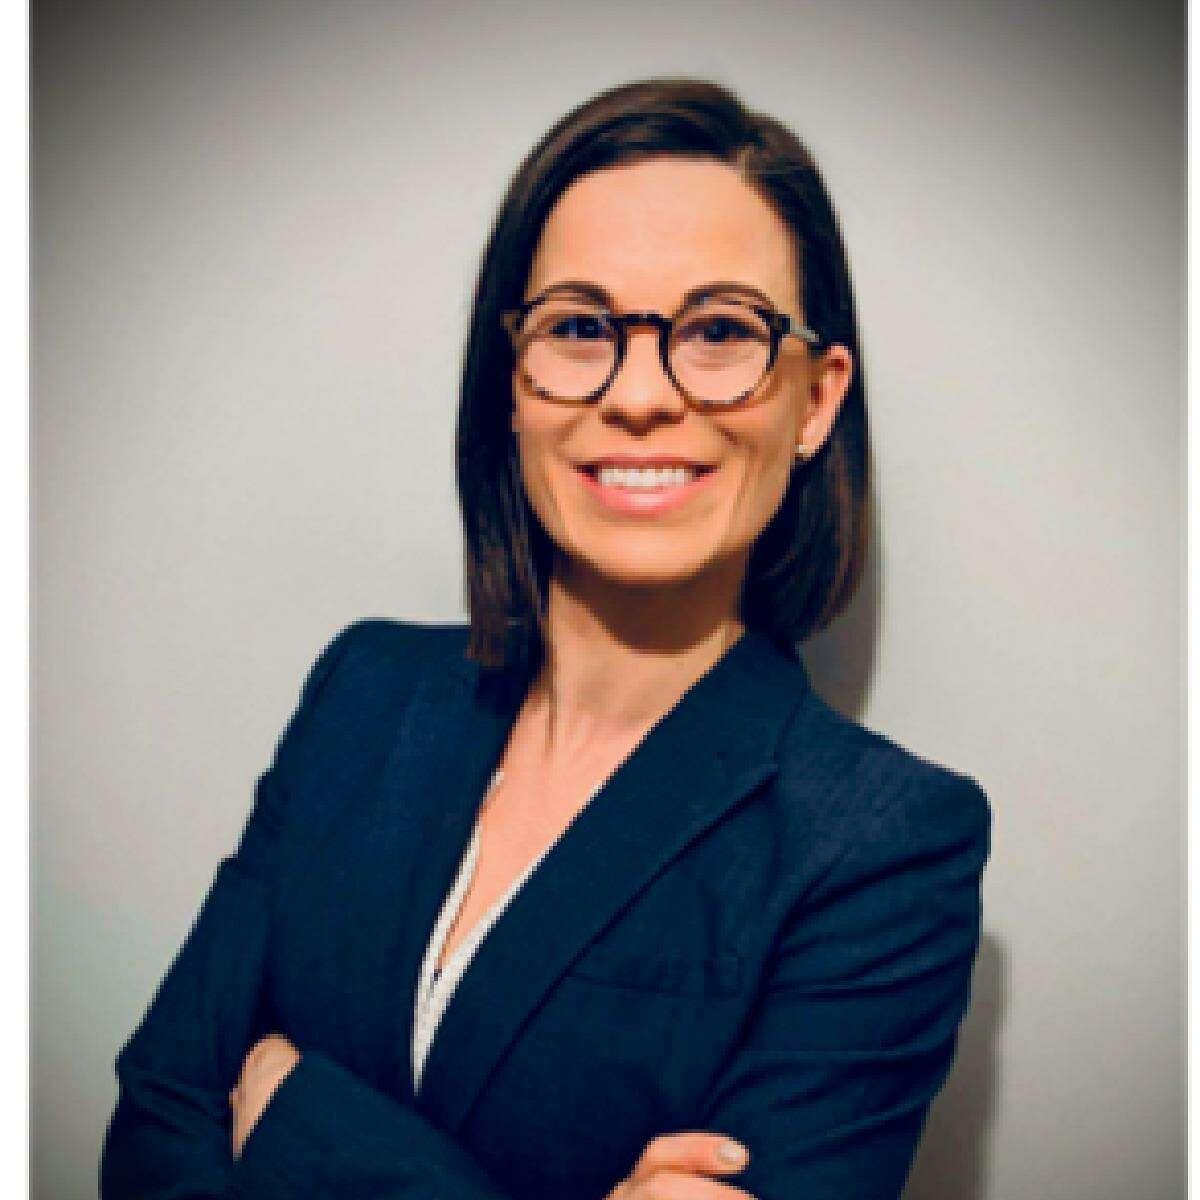 Nicole Esposito will become campus CEO of Manchester Community College in Manchester.